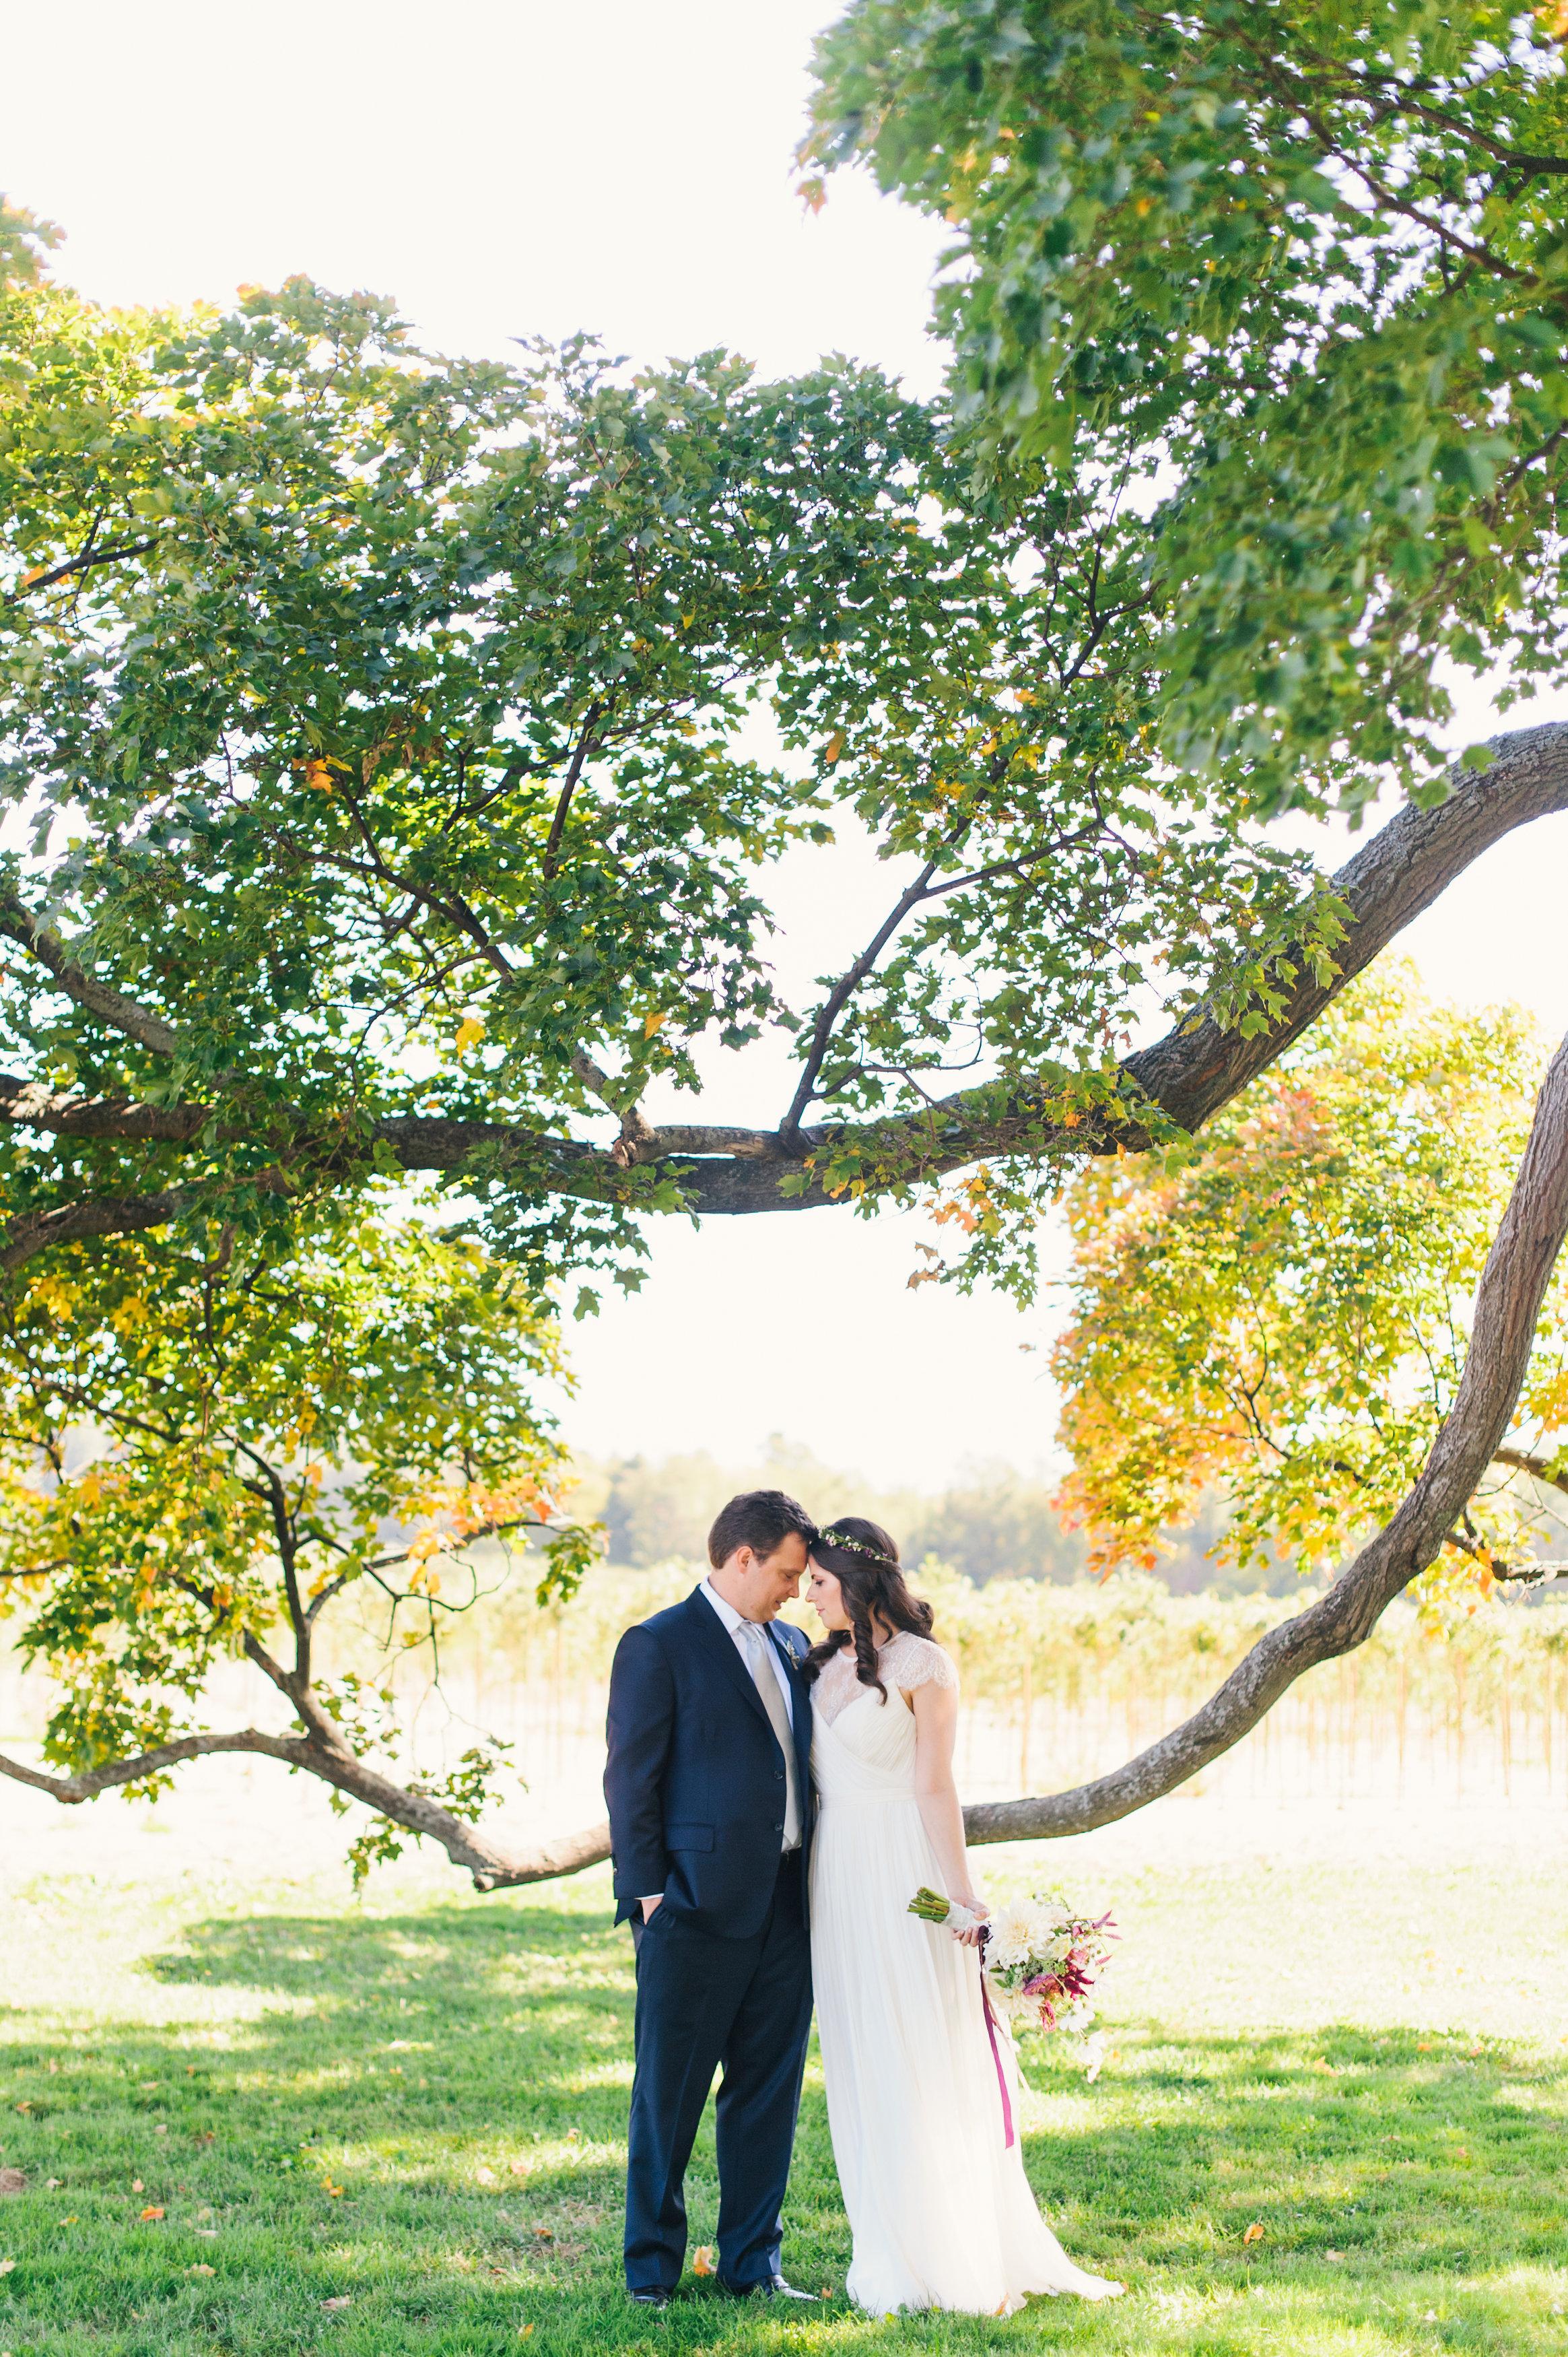 marial-daniel-wedding-balls-falls-sara-wilde-photography-0302.jpg